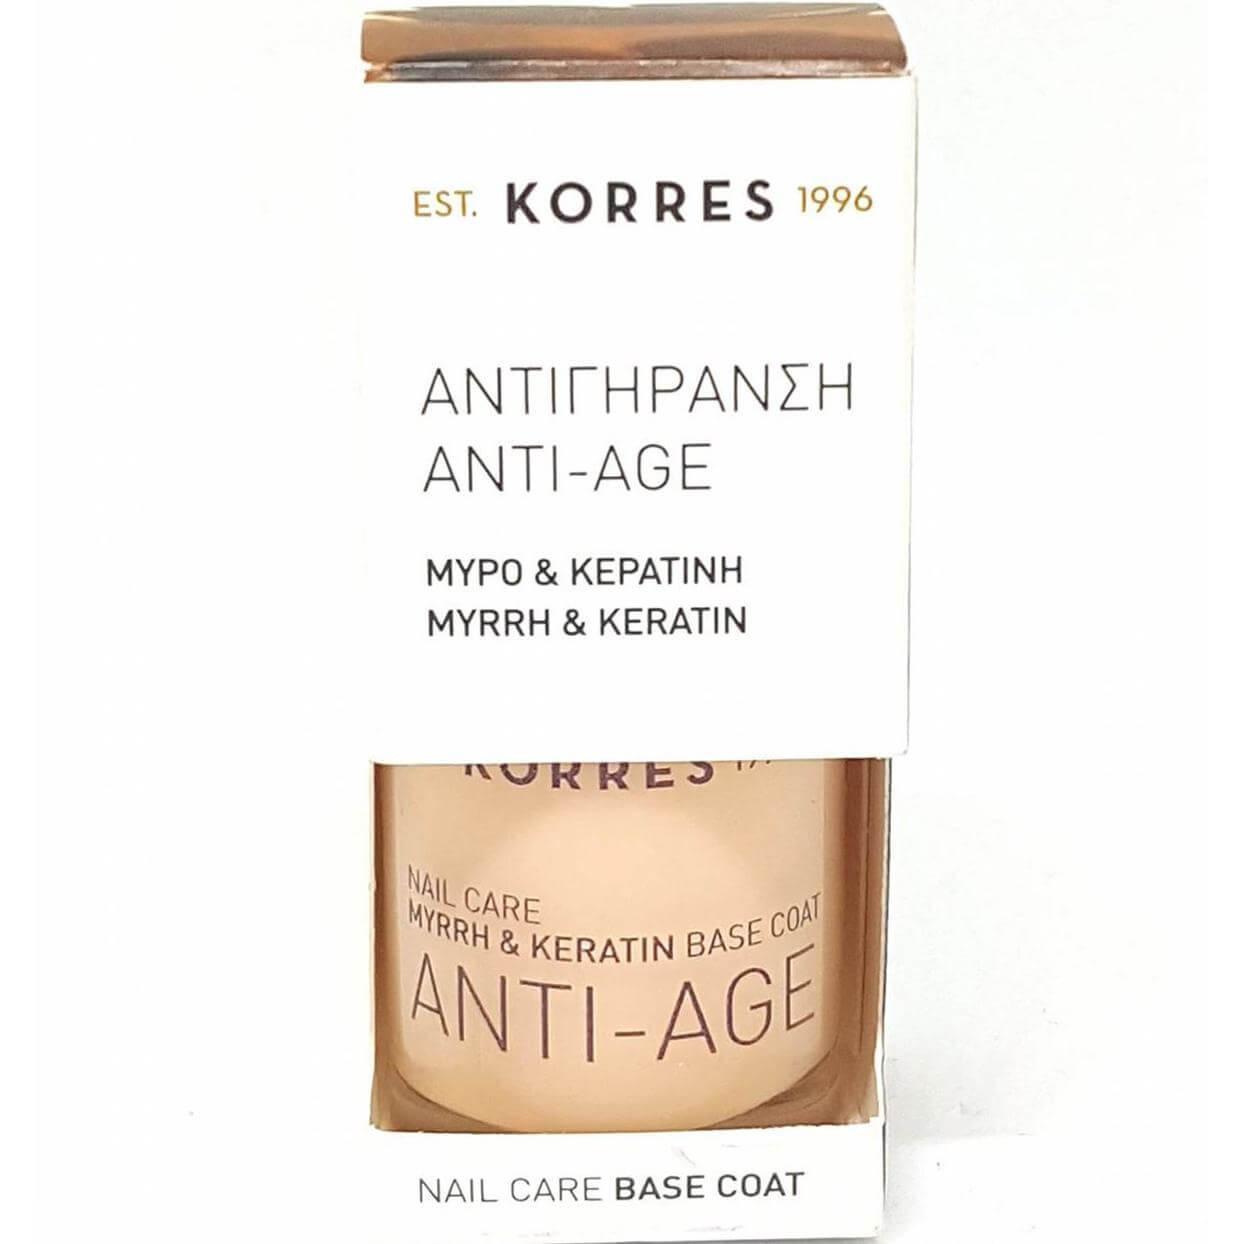 Korres Anti Age Base Coat Αντιγήρανση των Νυχιών με Μύρο & Κερατίνη, Δυναμώνει & υγιεινή   χέρια   φροντίδα νυχιών